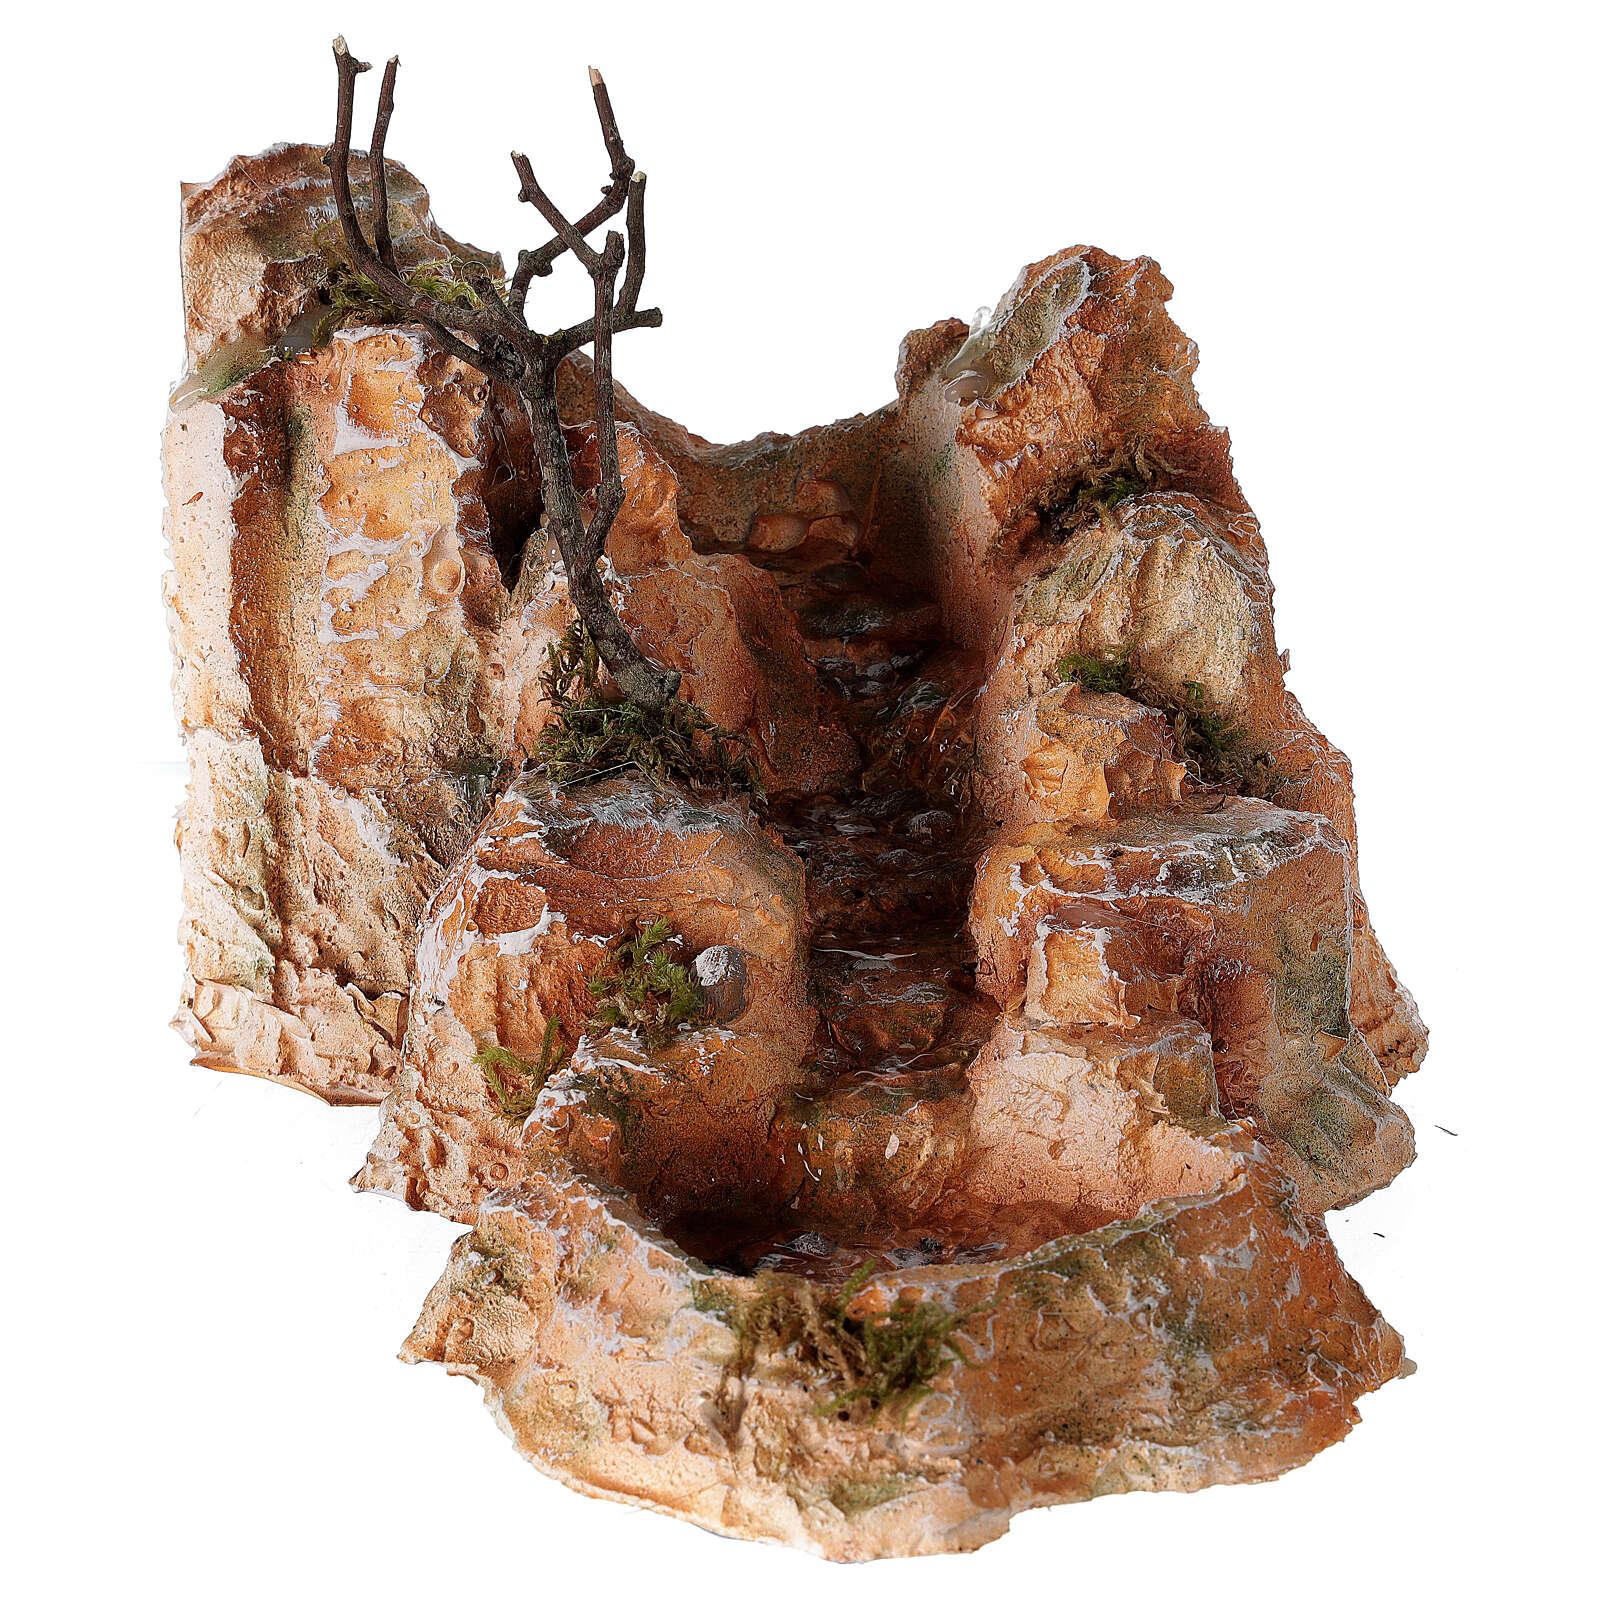 Ruscello resina stile arabo 15x25x30 cm presepe napoletano 6-8 cm 4